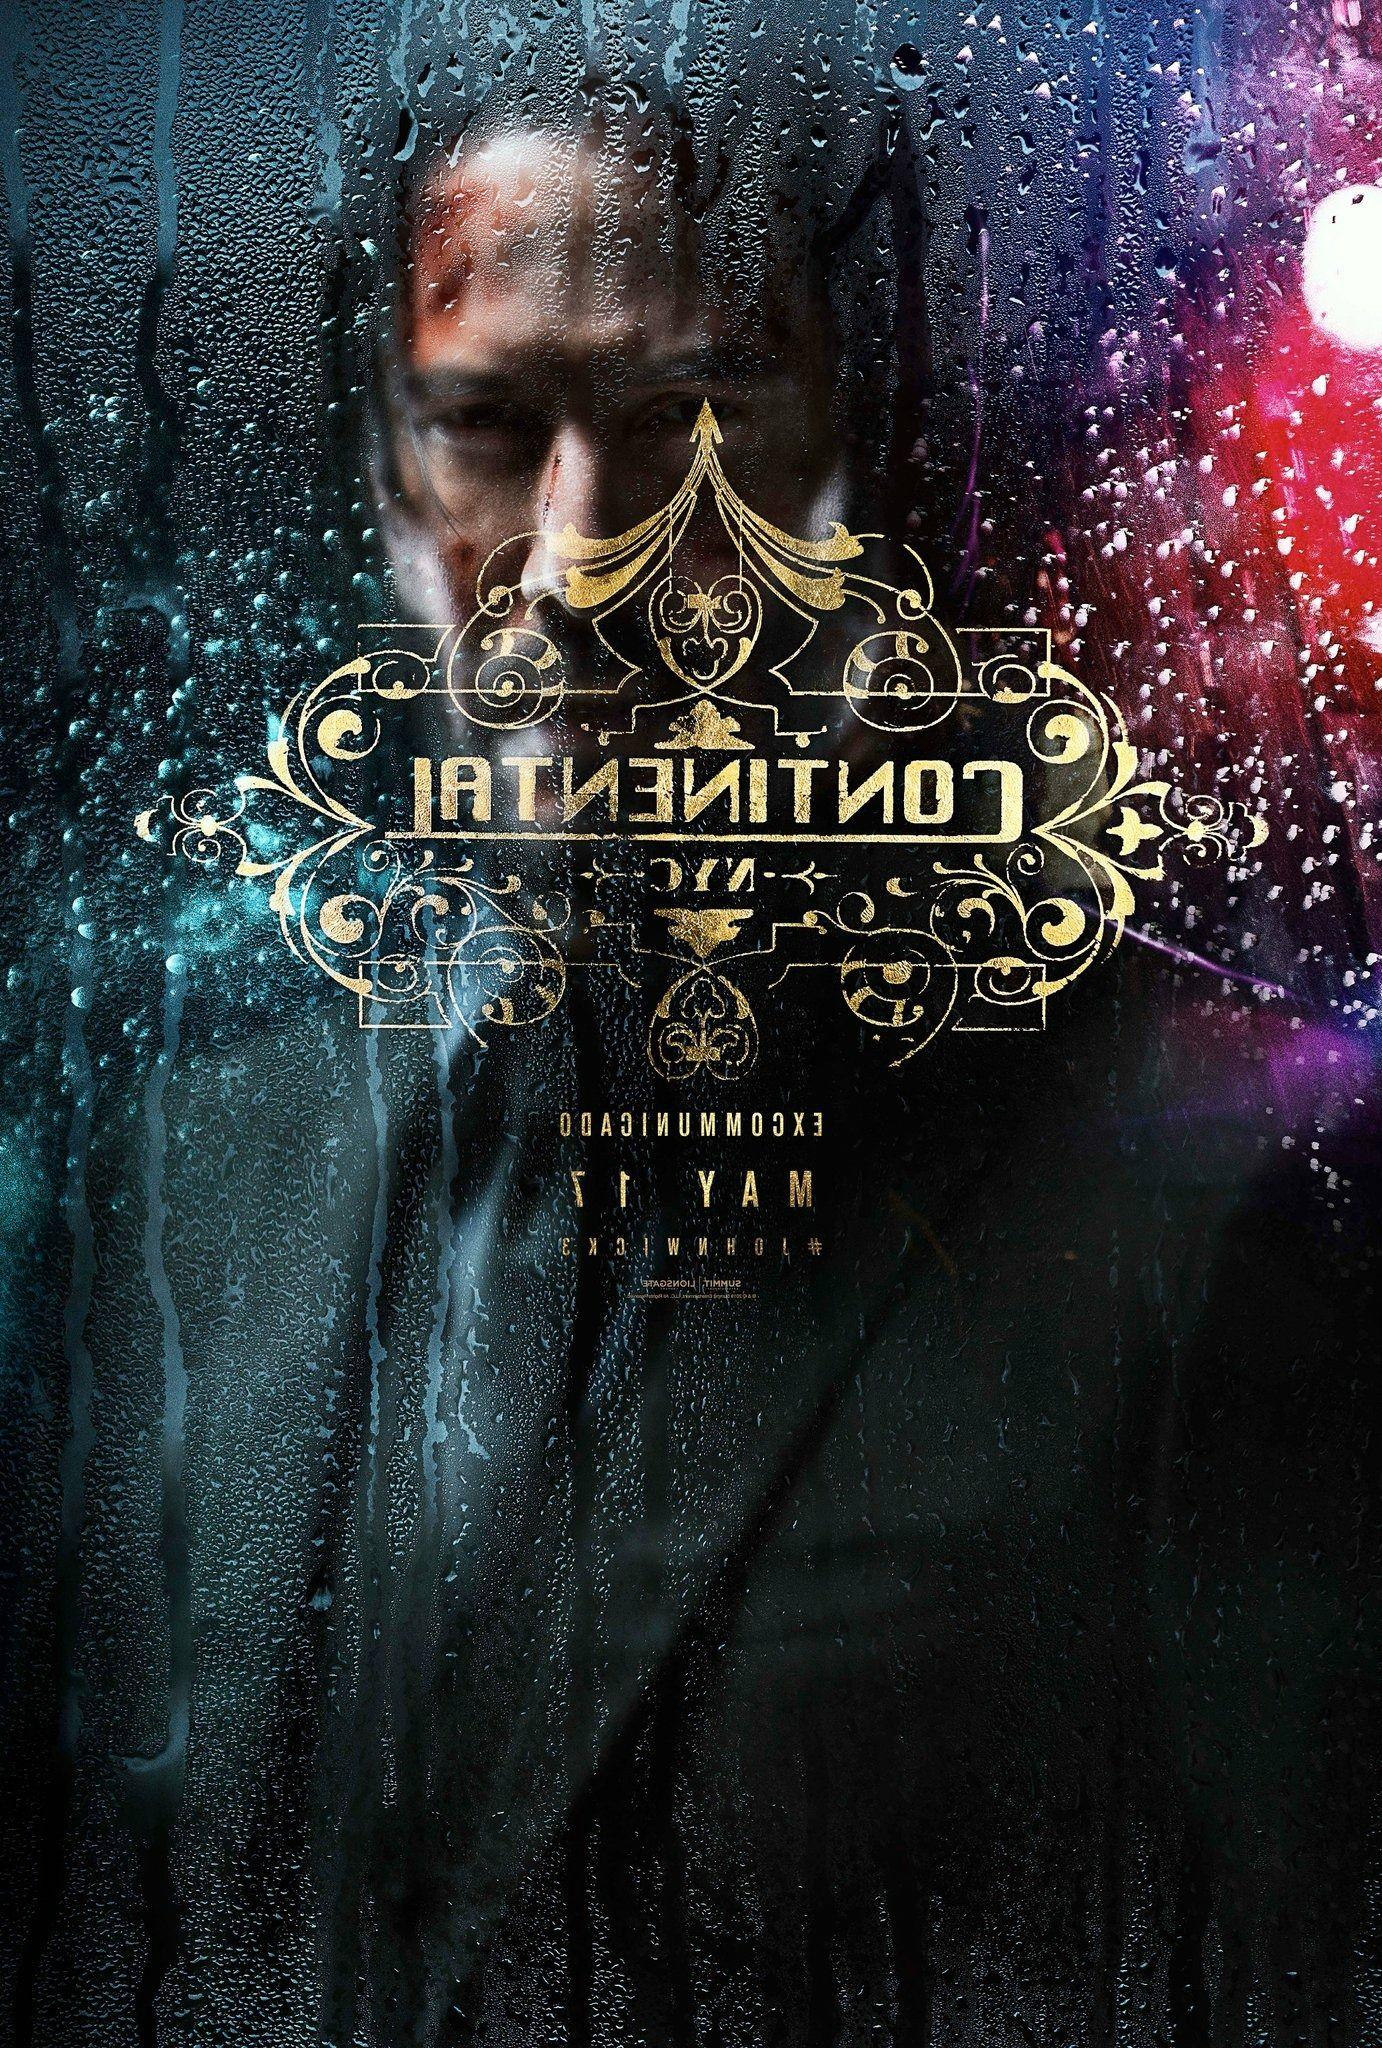 John Wick Chapter 3 Watch John Wick Keanu Reeves Movie Posters